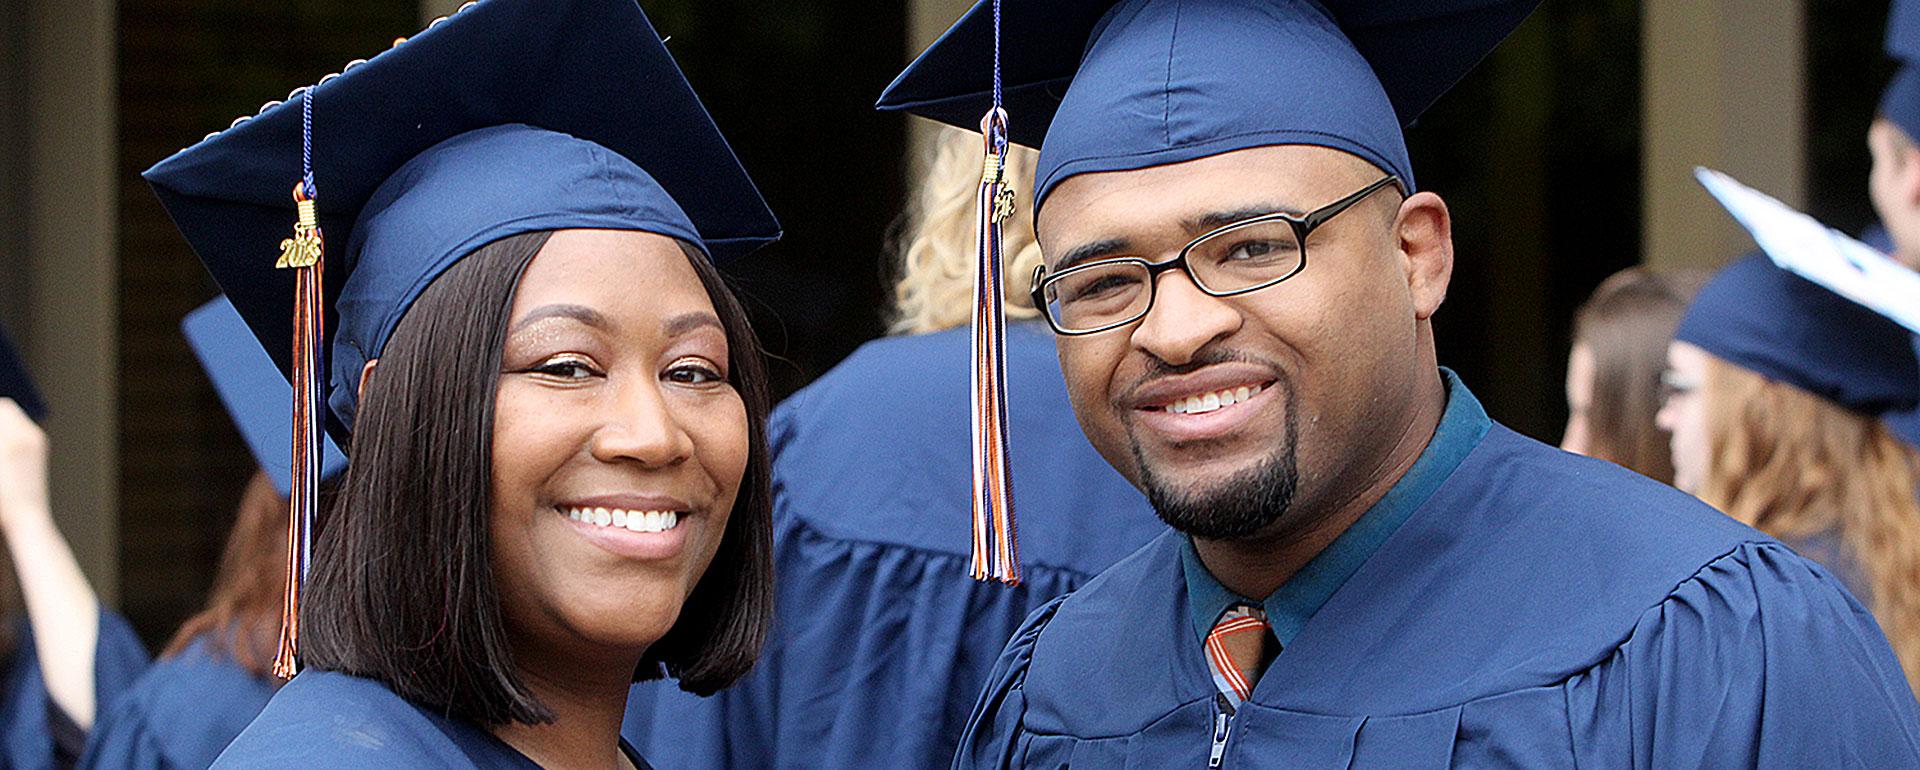 Photo of graduates